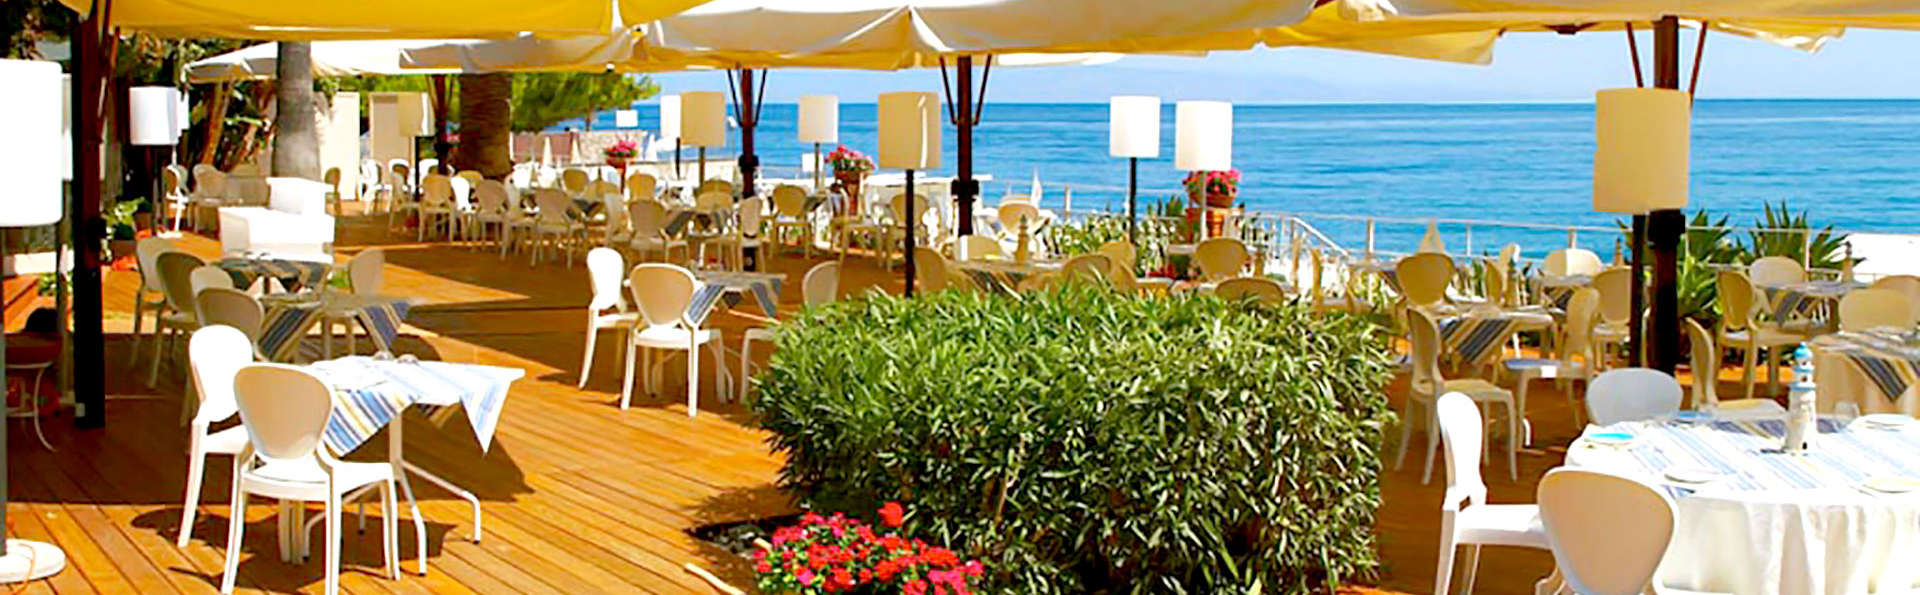 Hotel Caparena - Edit_Terrace.jpg